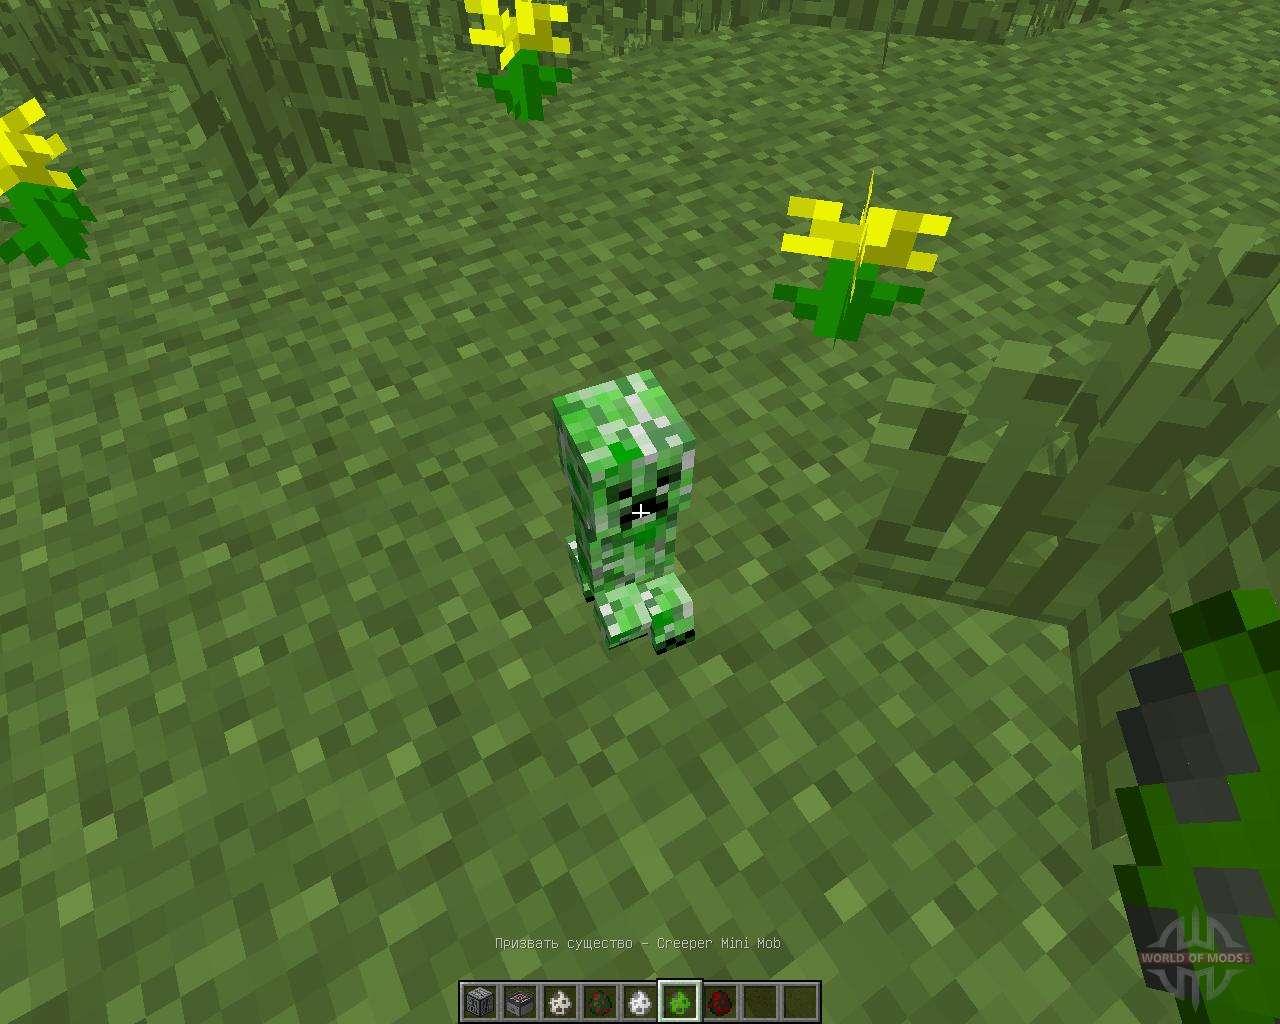 Моды на мобов для Майнкрафт | Minecraft